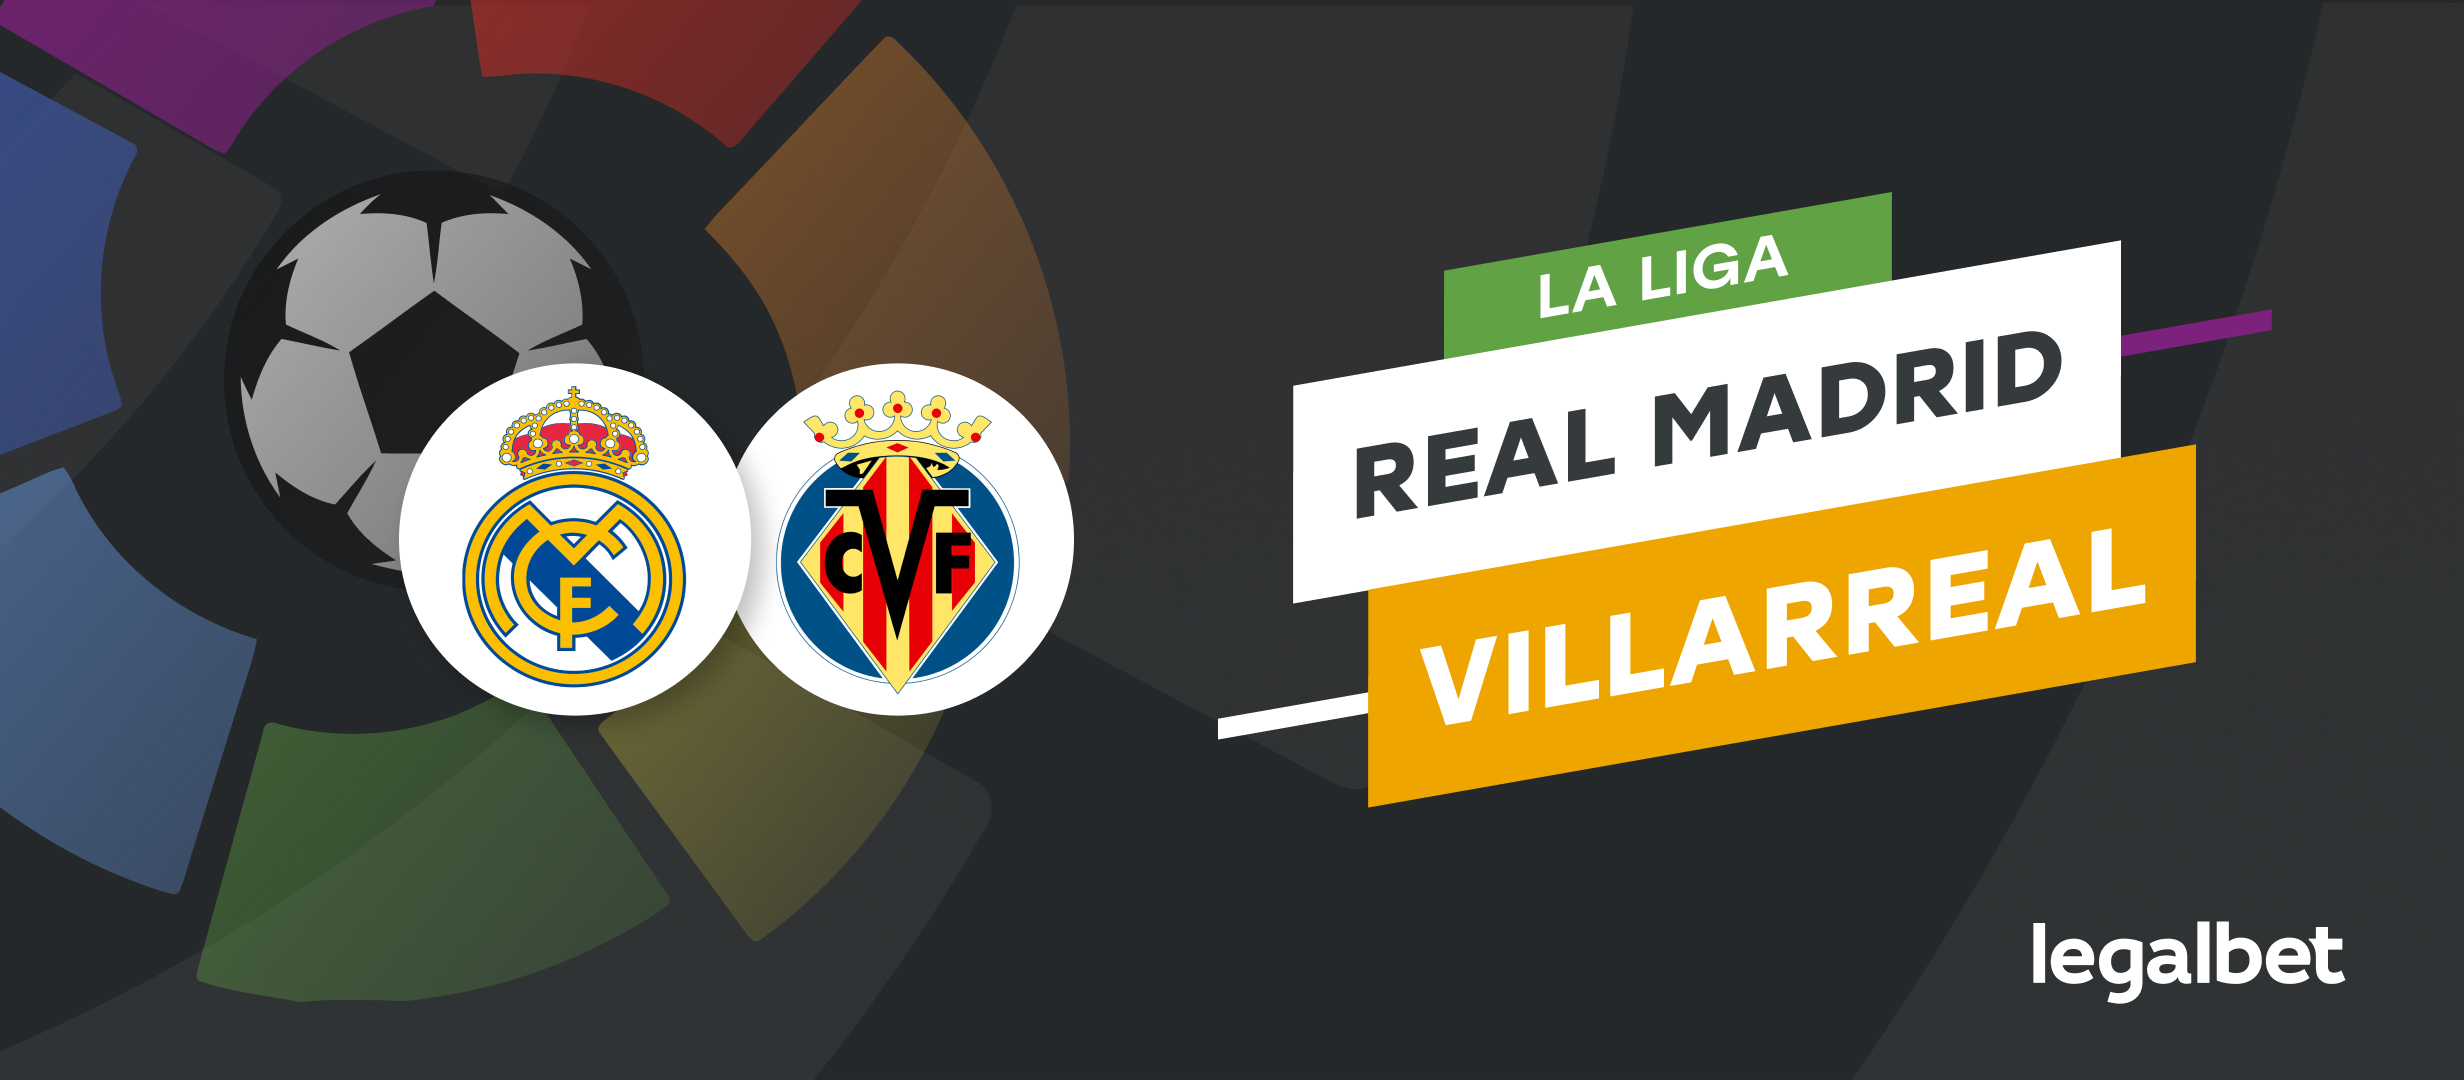 Real Madrid vs Villarreal – cote la pariuri, ponturi si informatii